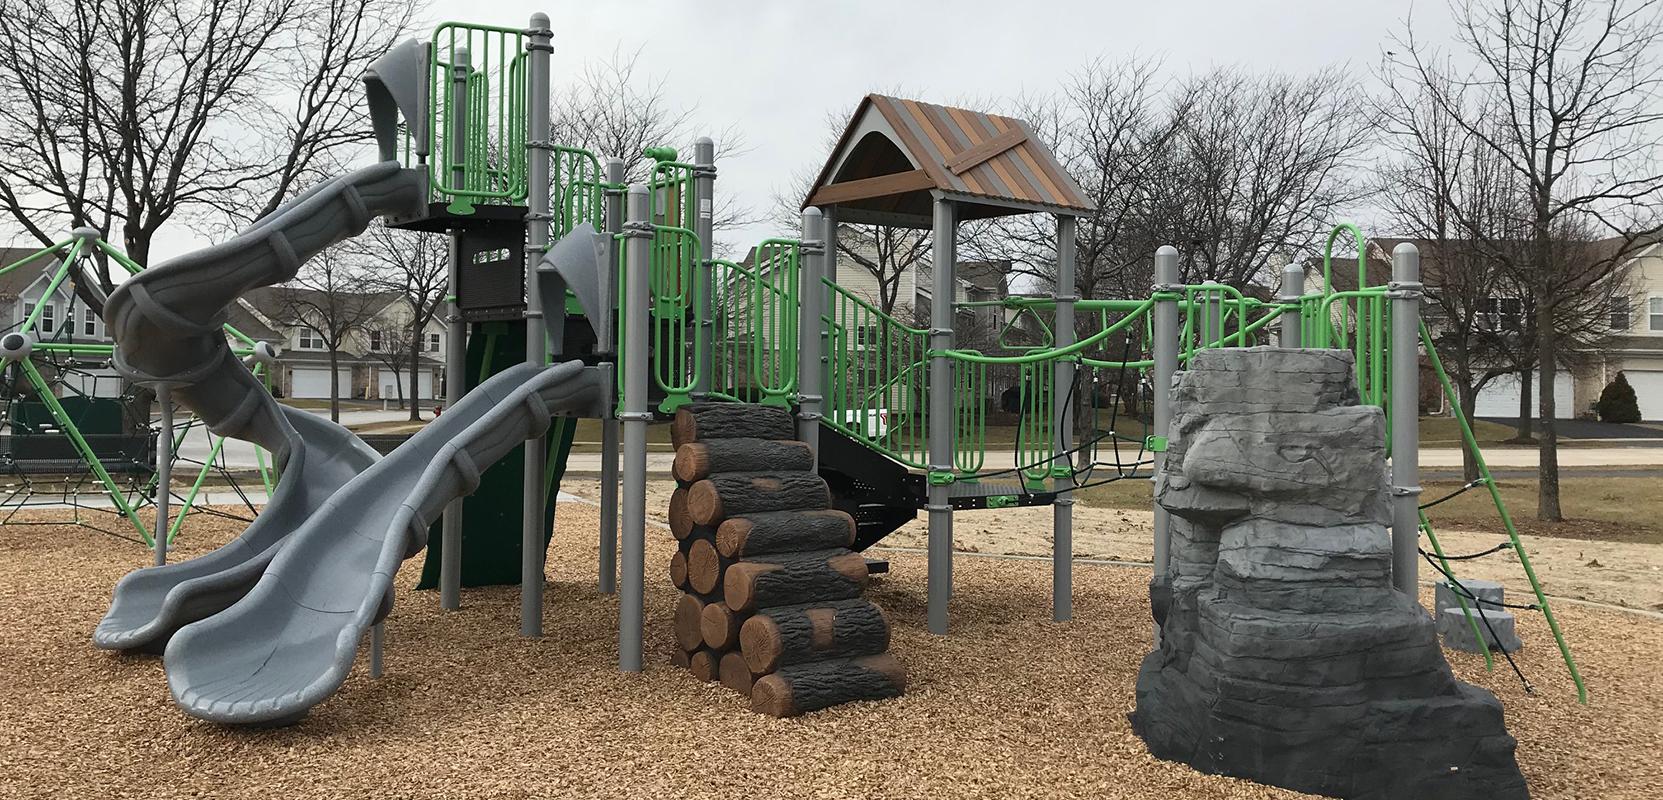 Kidtowne Park